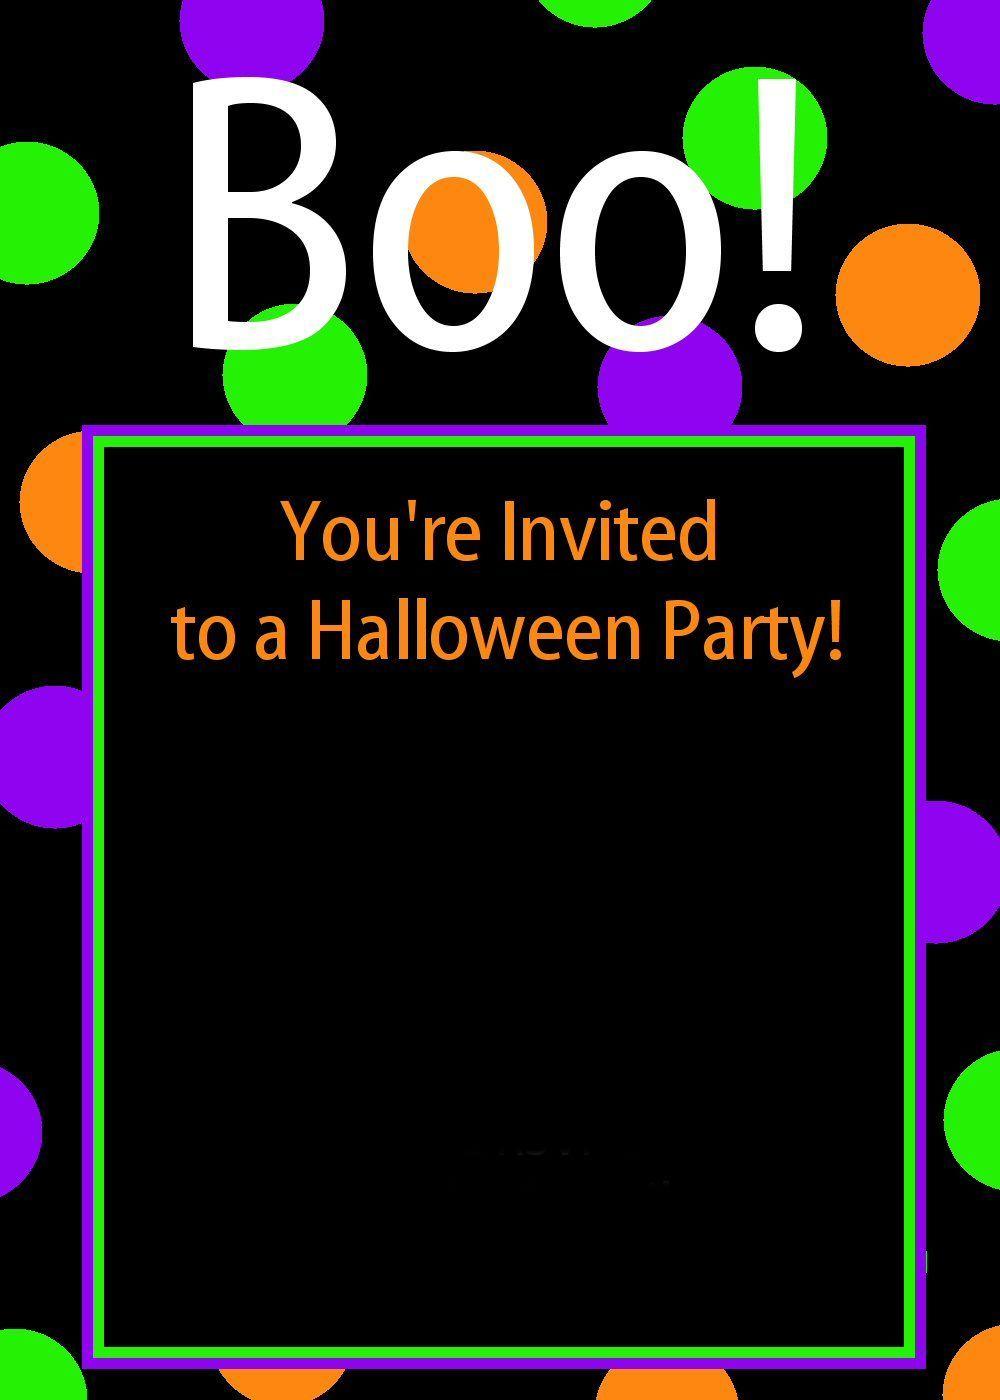 Cute Free Printable Halloween Invitations | Celebrate: Halloween - Free Printable Halloween Birthday Party Invitations